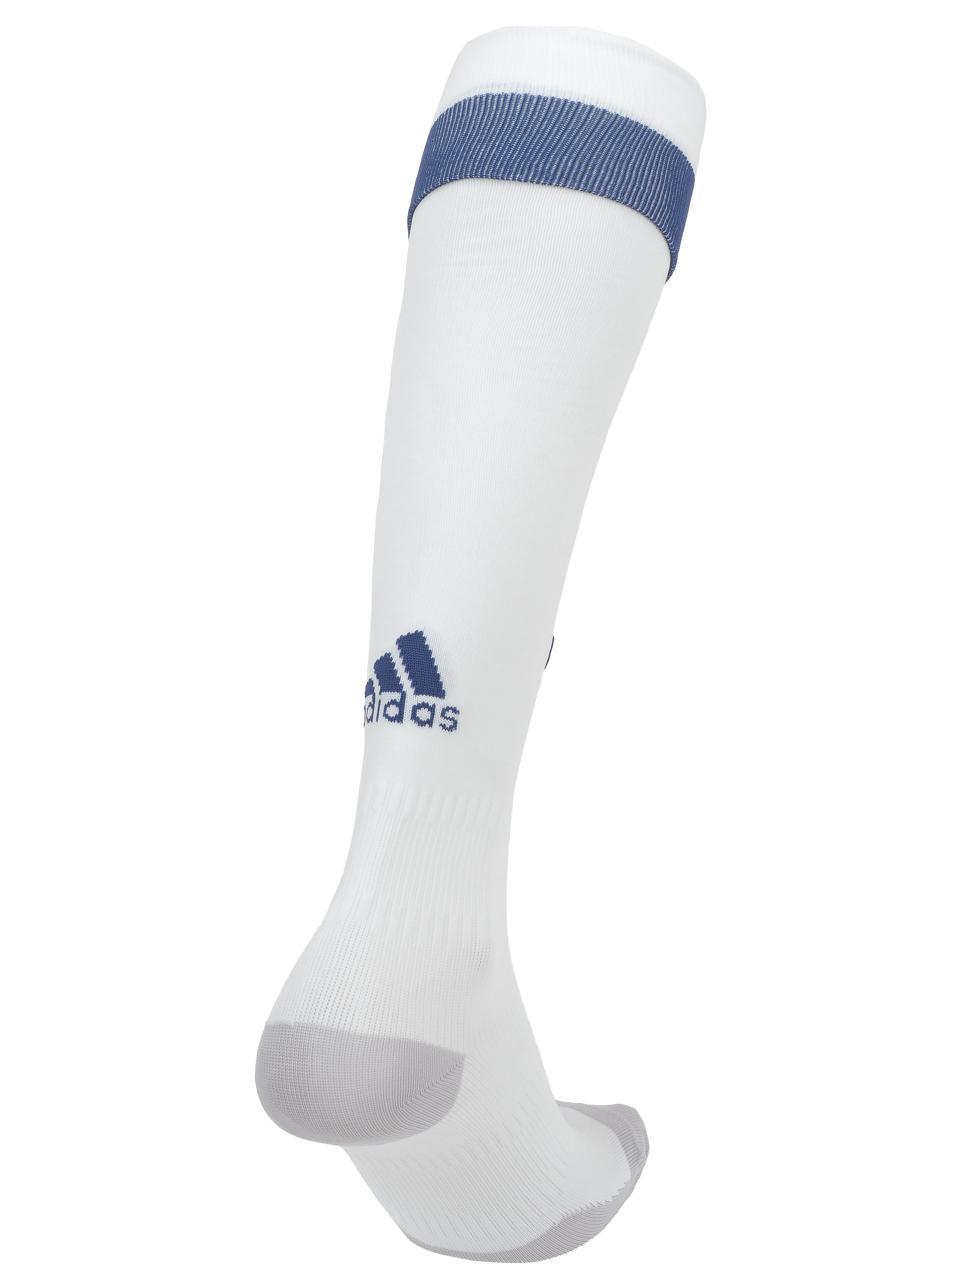 Chaussettes-de-football-Adidas-Real-cho7-16-17-blc-Blanc-32082-Neuf